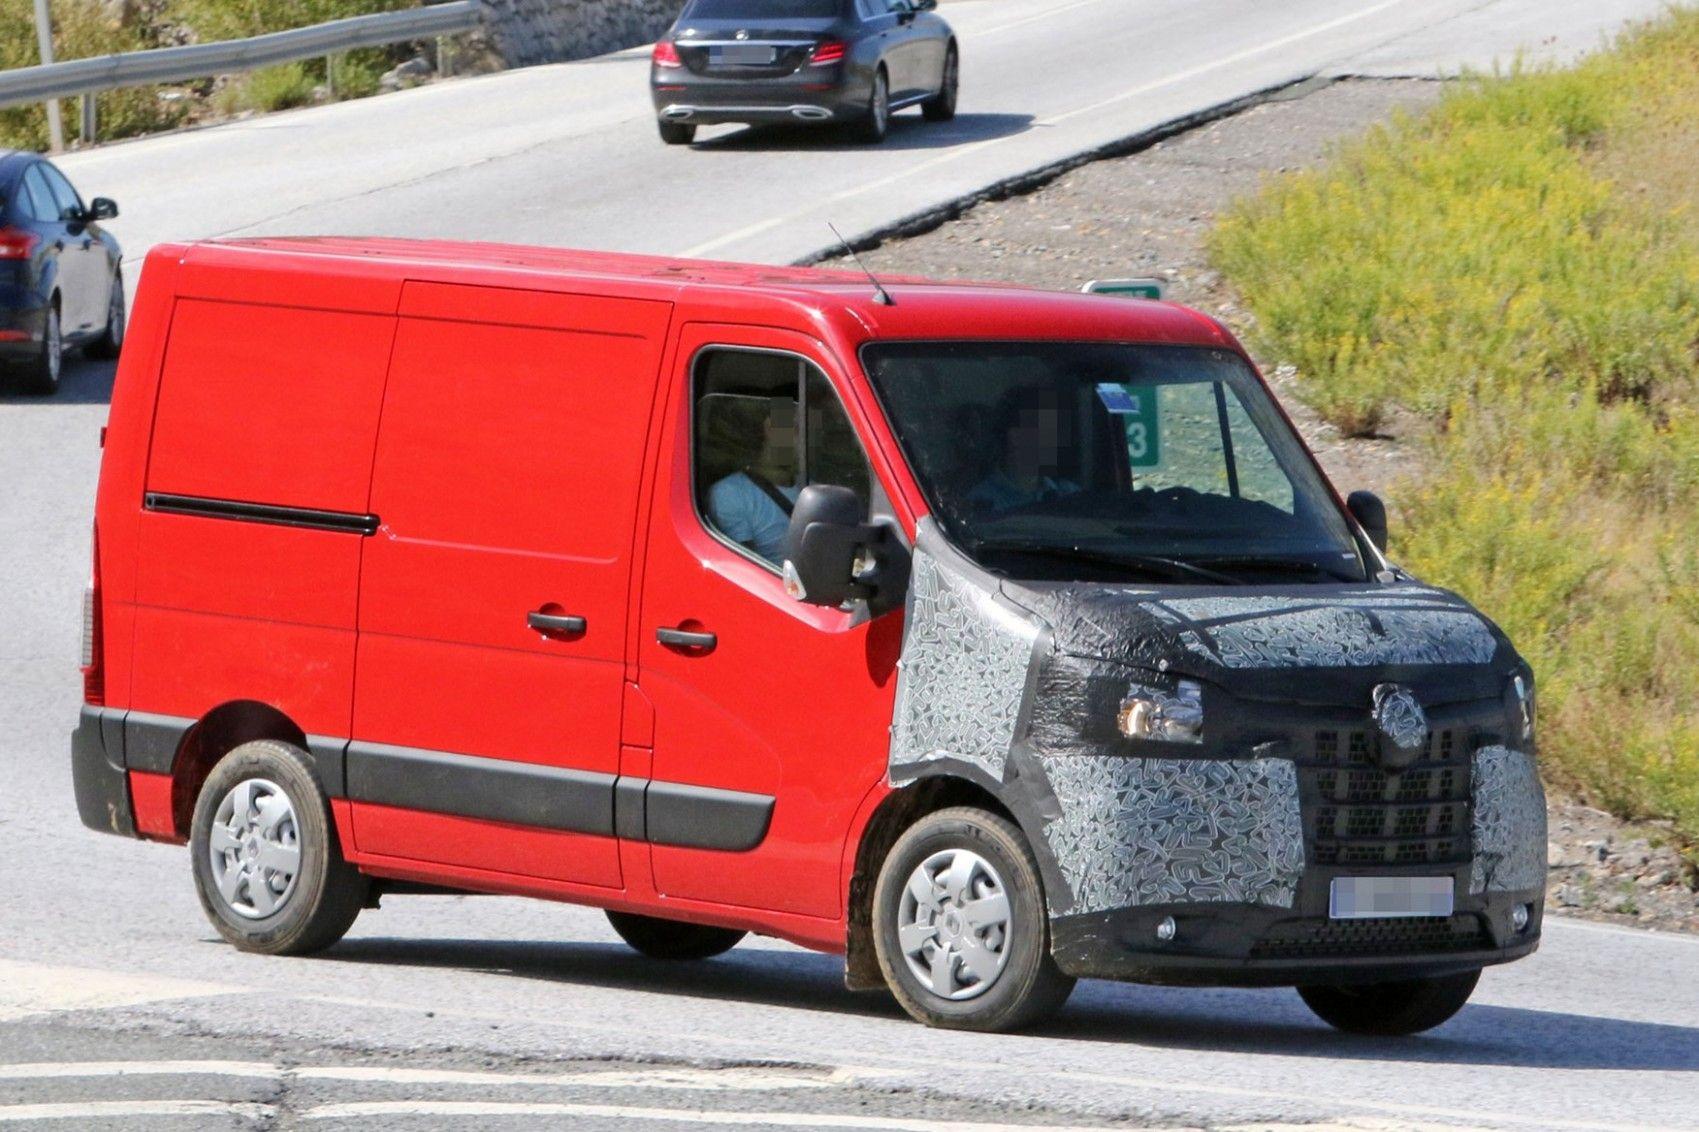 The Real Reason Behind 2020 Opel Movano Design